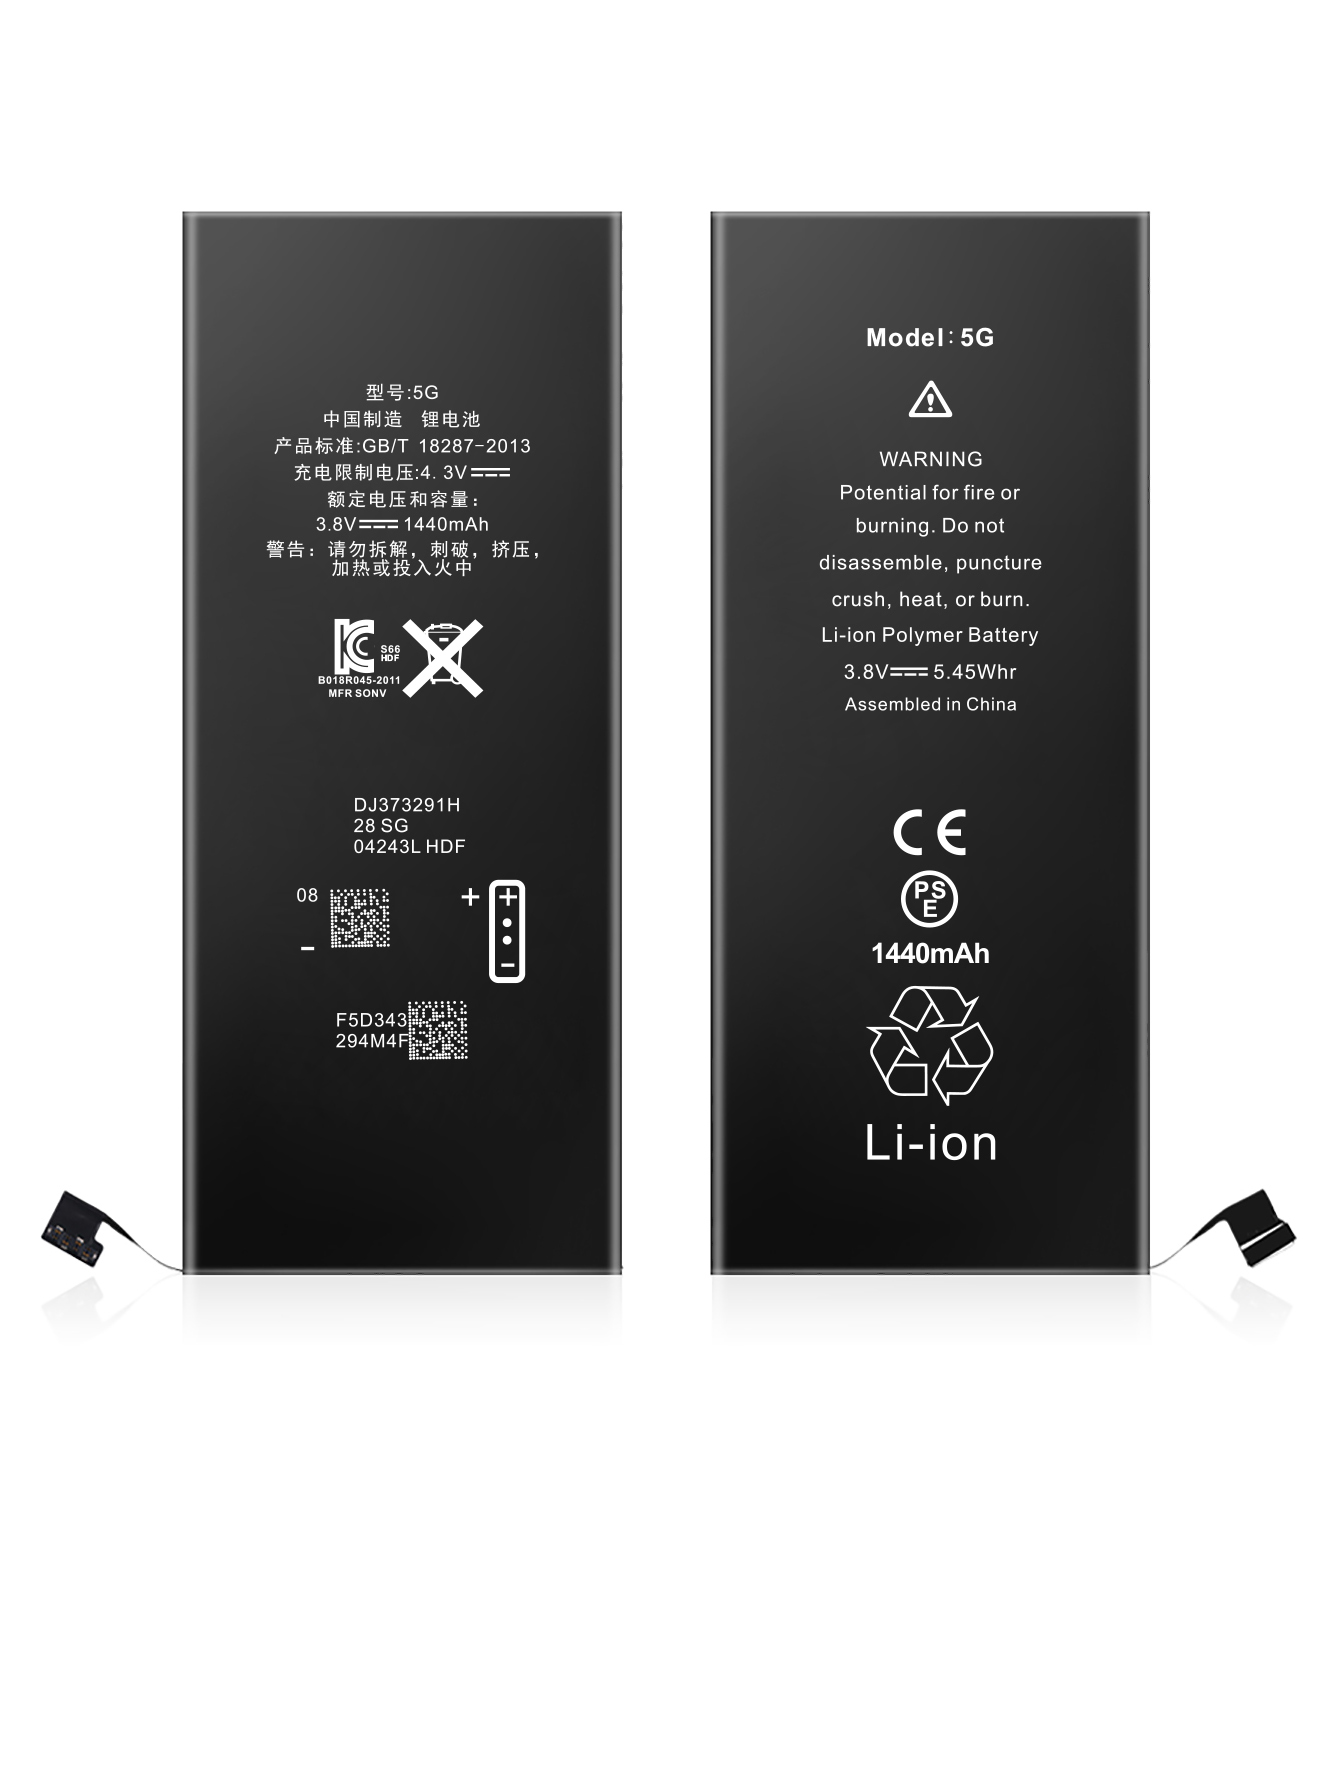 Аккумулятор для смартфона Wewo для iPhone 5 (1440mAh)